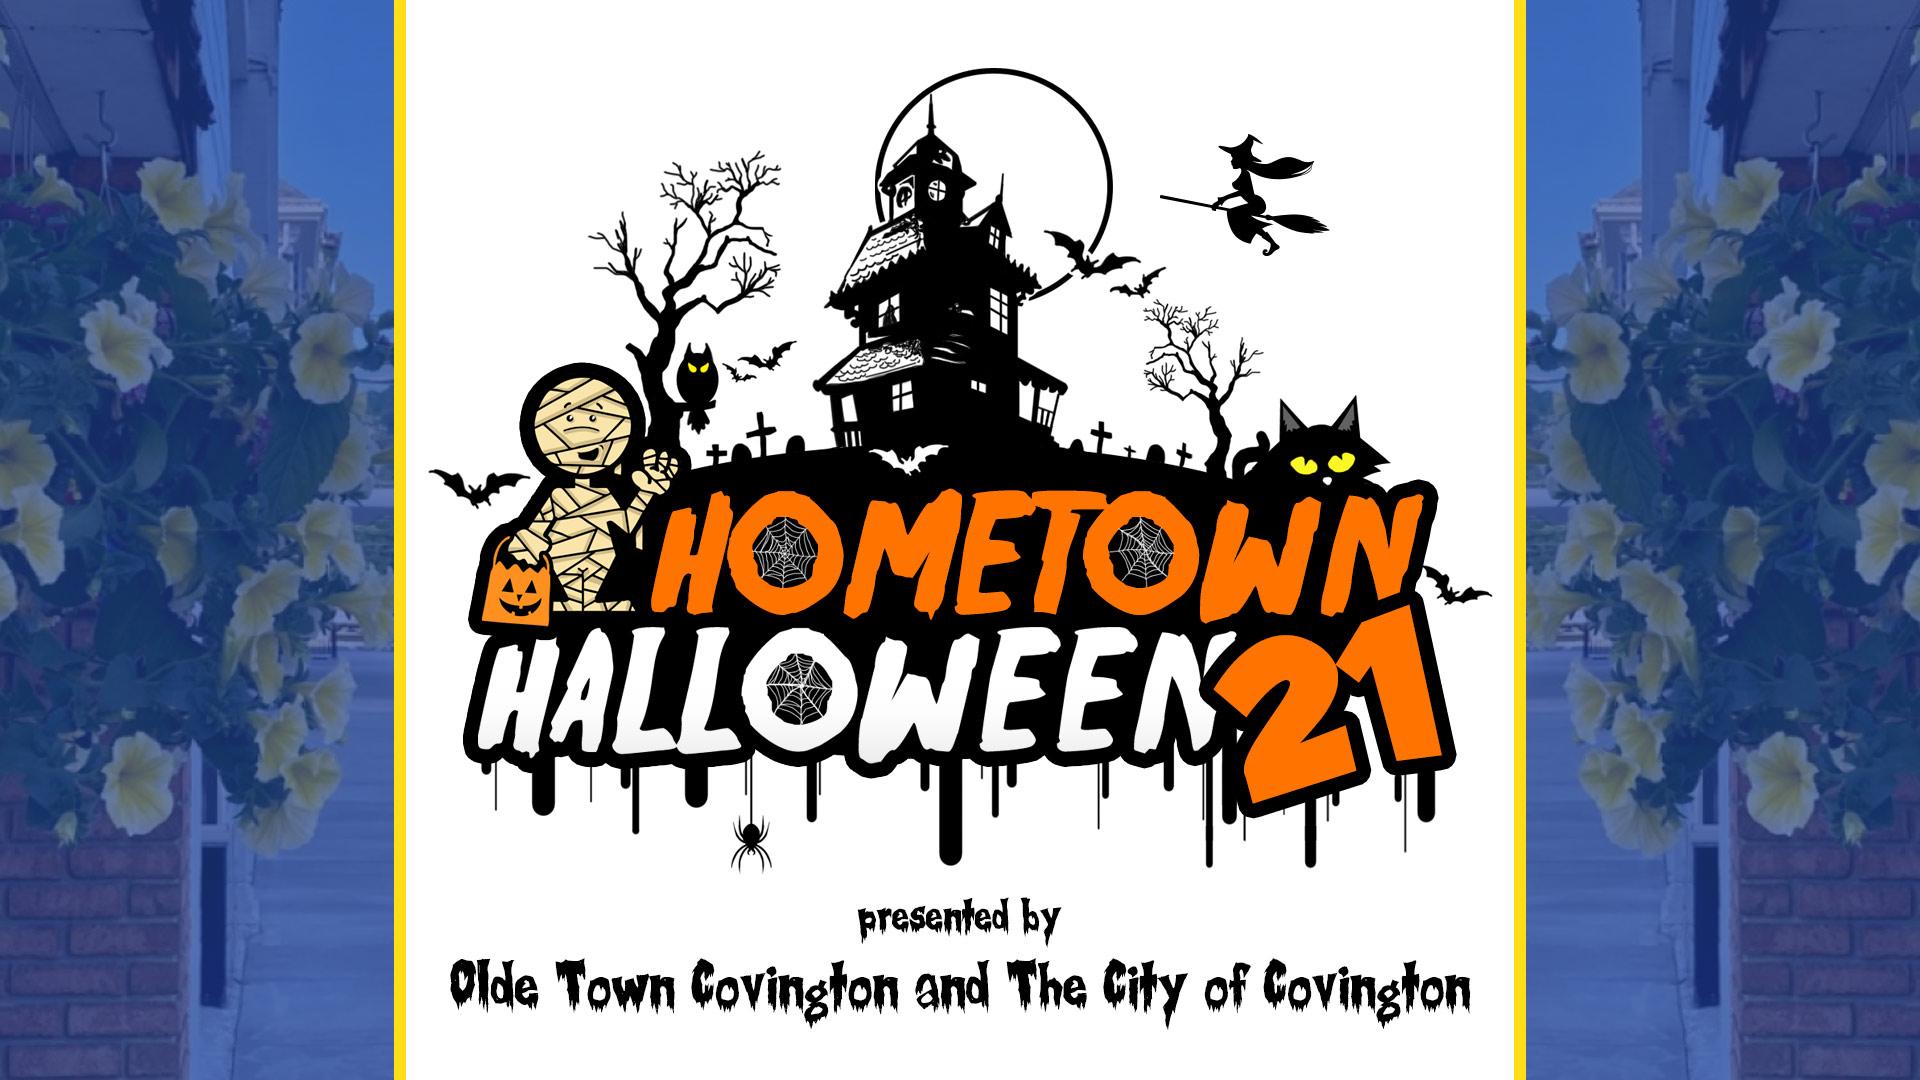 Hometownhalloween